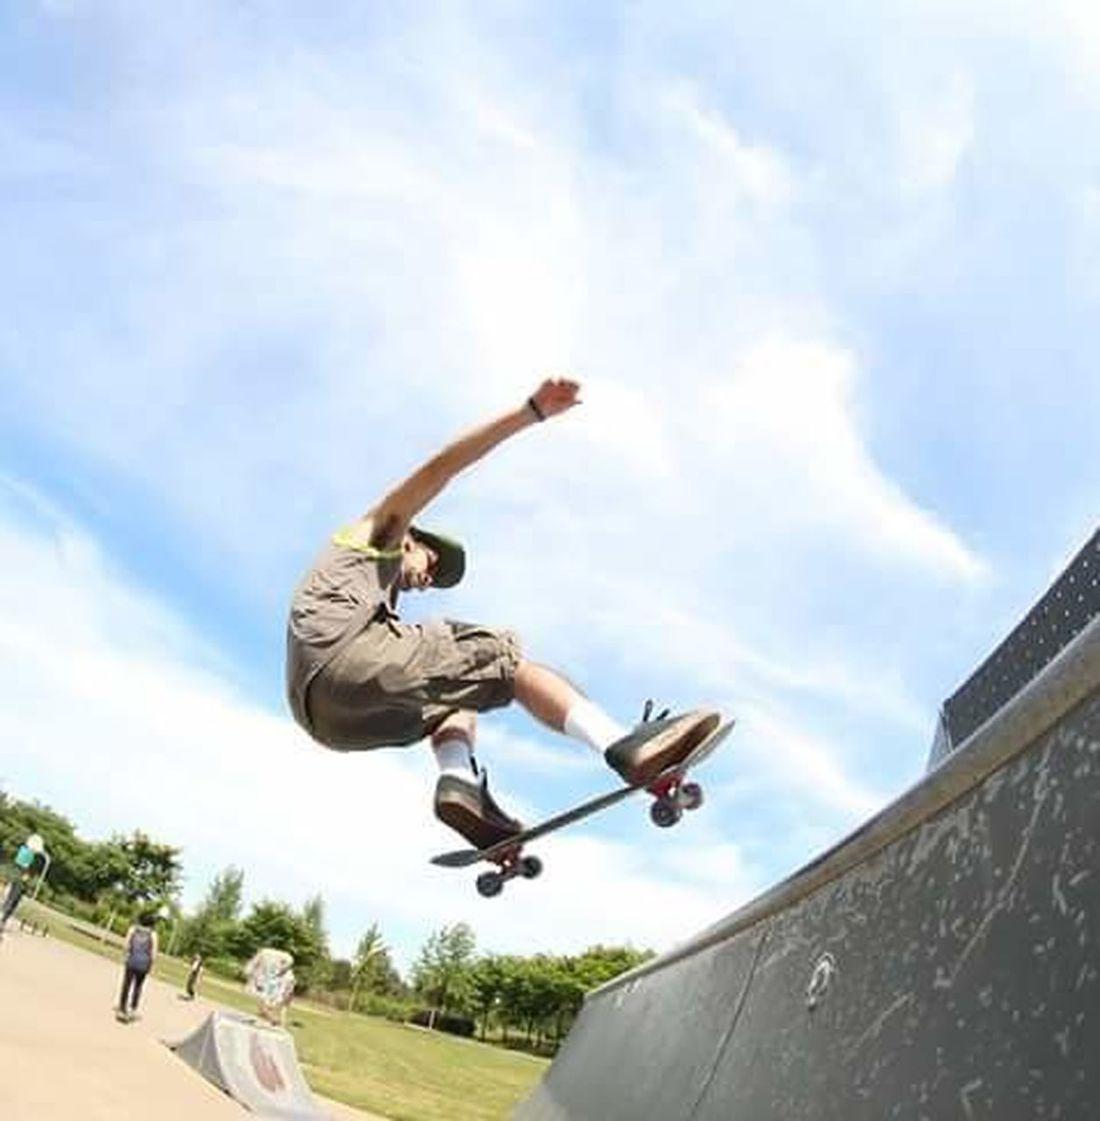 Athleisure Skate Or Die Thrashers Fly High Trick Photography Skatelife Skateboard Skate Till I Die Shredthegnar Skaters Skate Park Skateeverydamnday Festive Season Pivotal Ideas